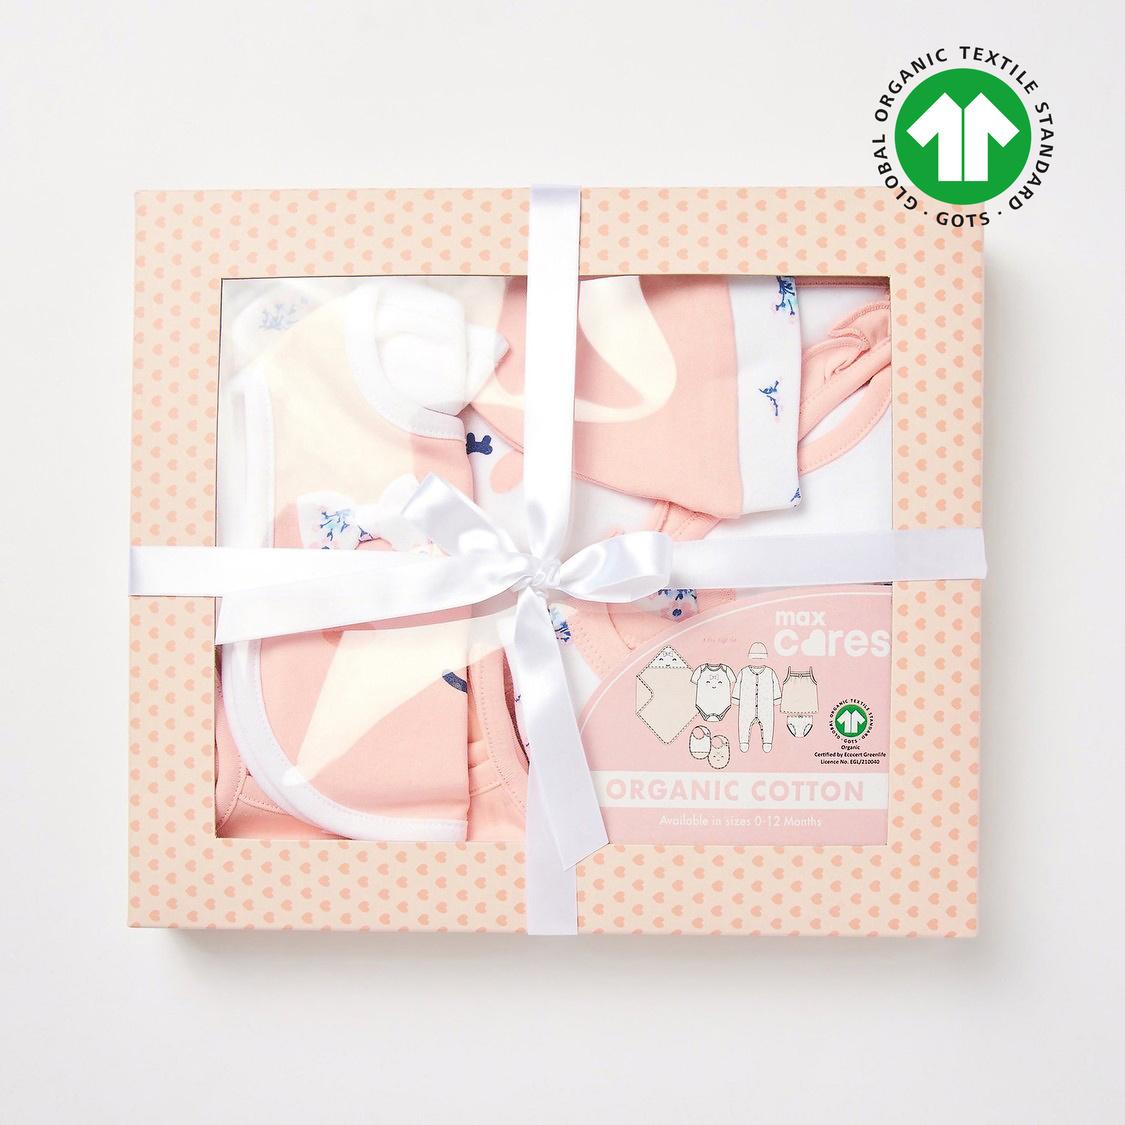 Floral Print GOTS Organic Cotton 8-Piece Gift Set